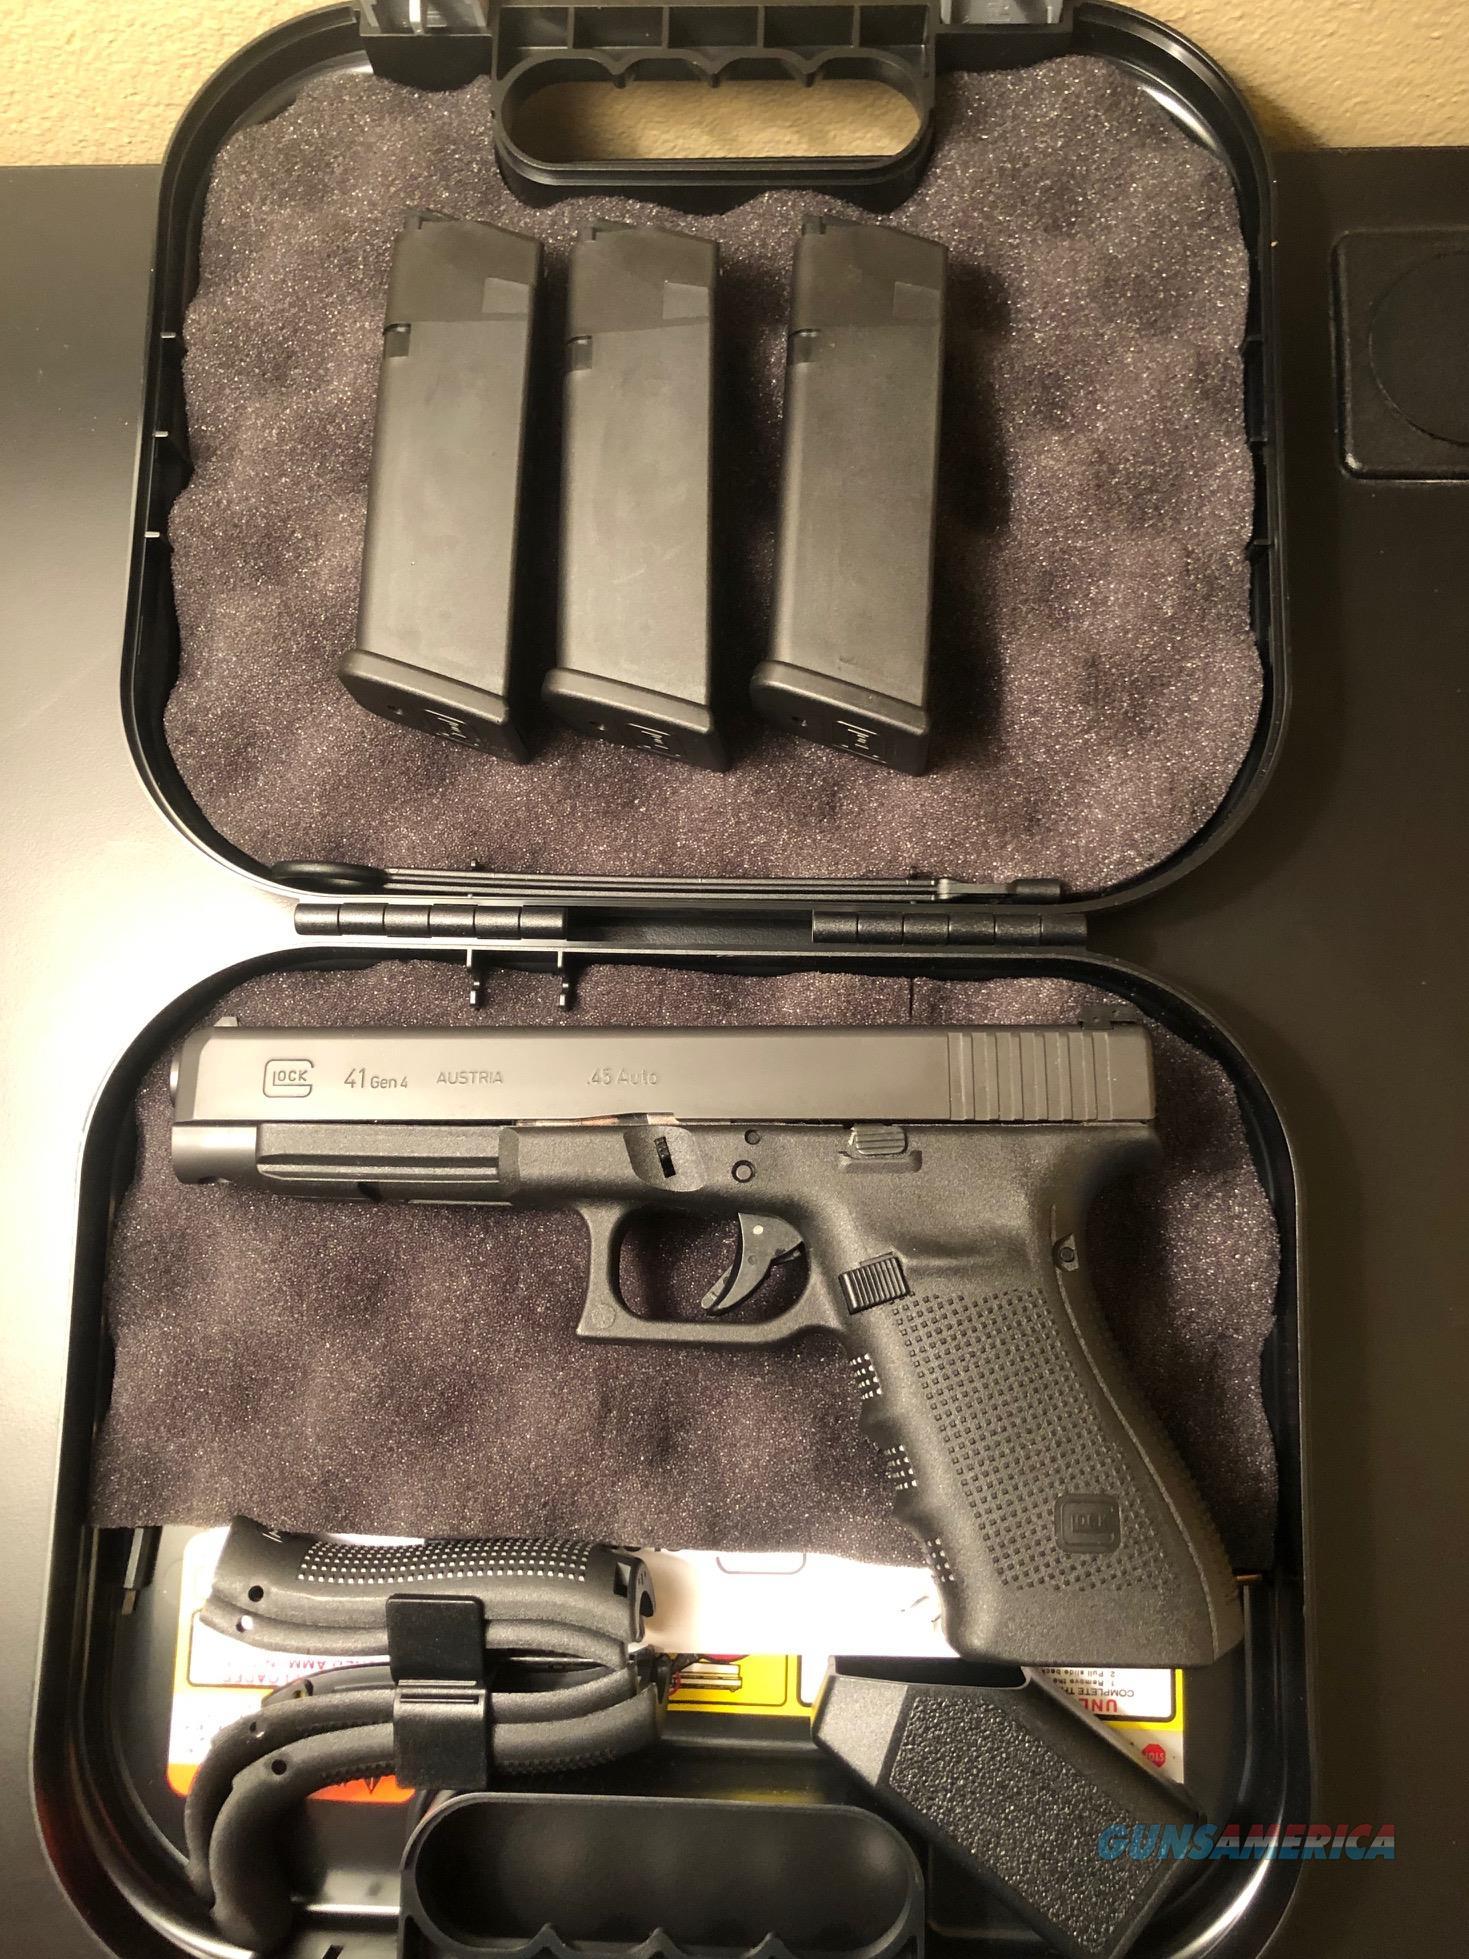 Glock 41 45 ACP  Guns > Pistols > Glock Pistols > 41